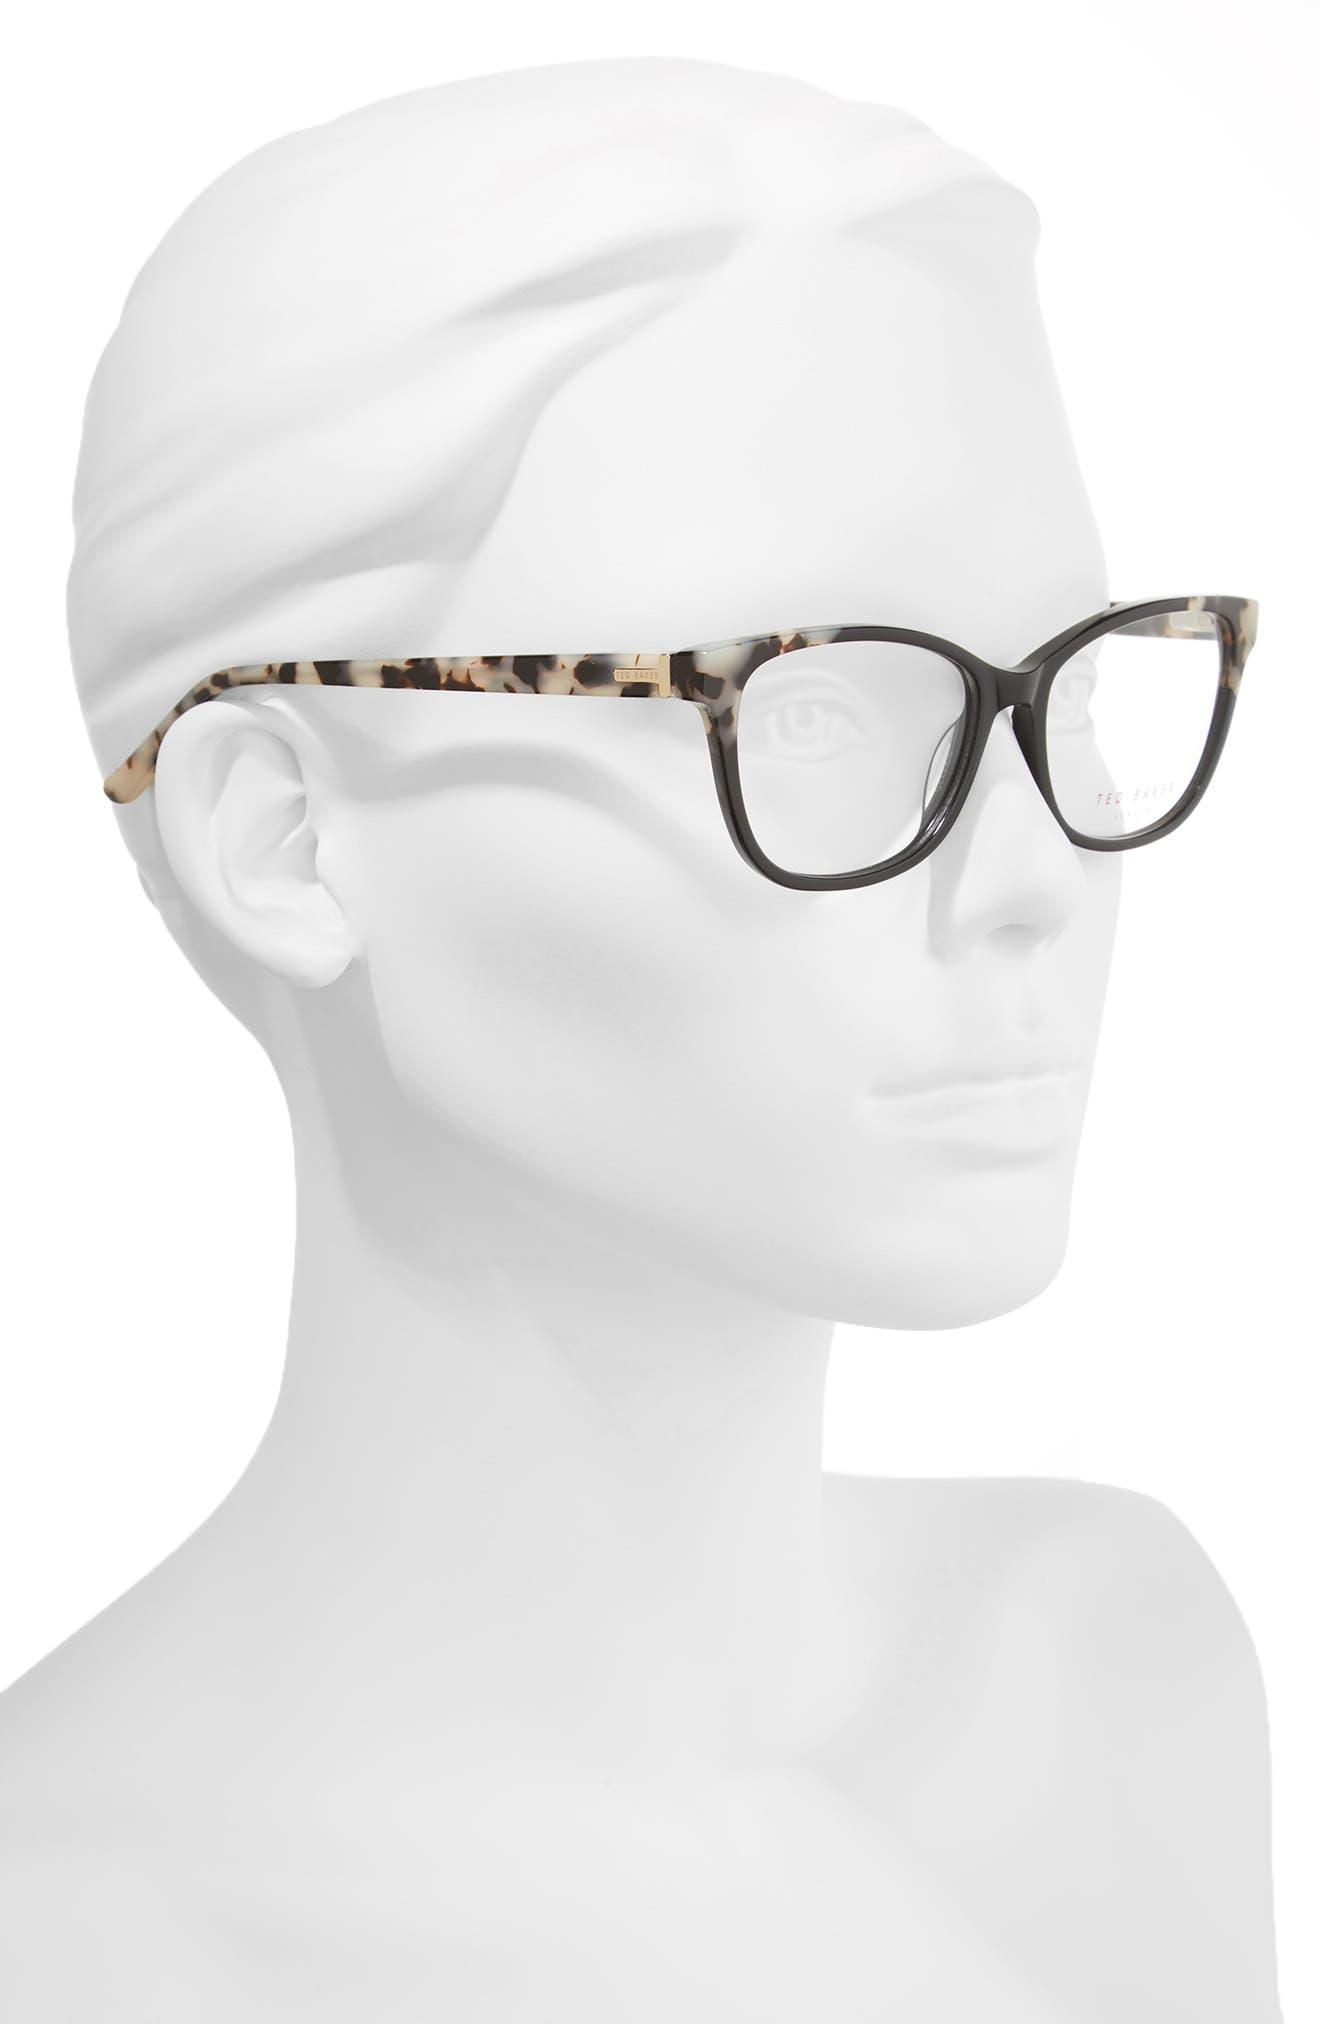 52mm Square Optical Glasses,                             Alternate thumbnail 2, color,                             Black